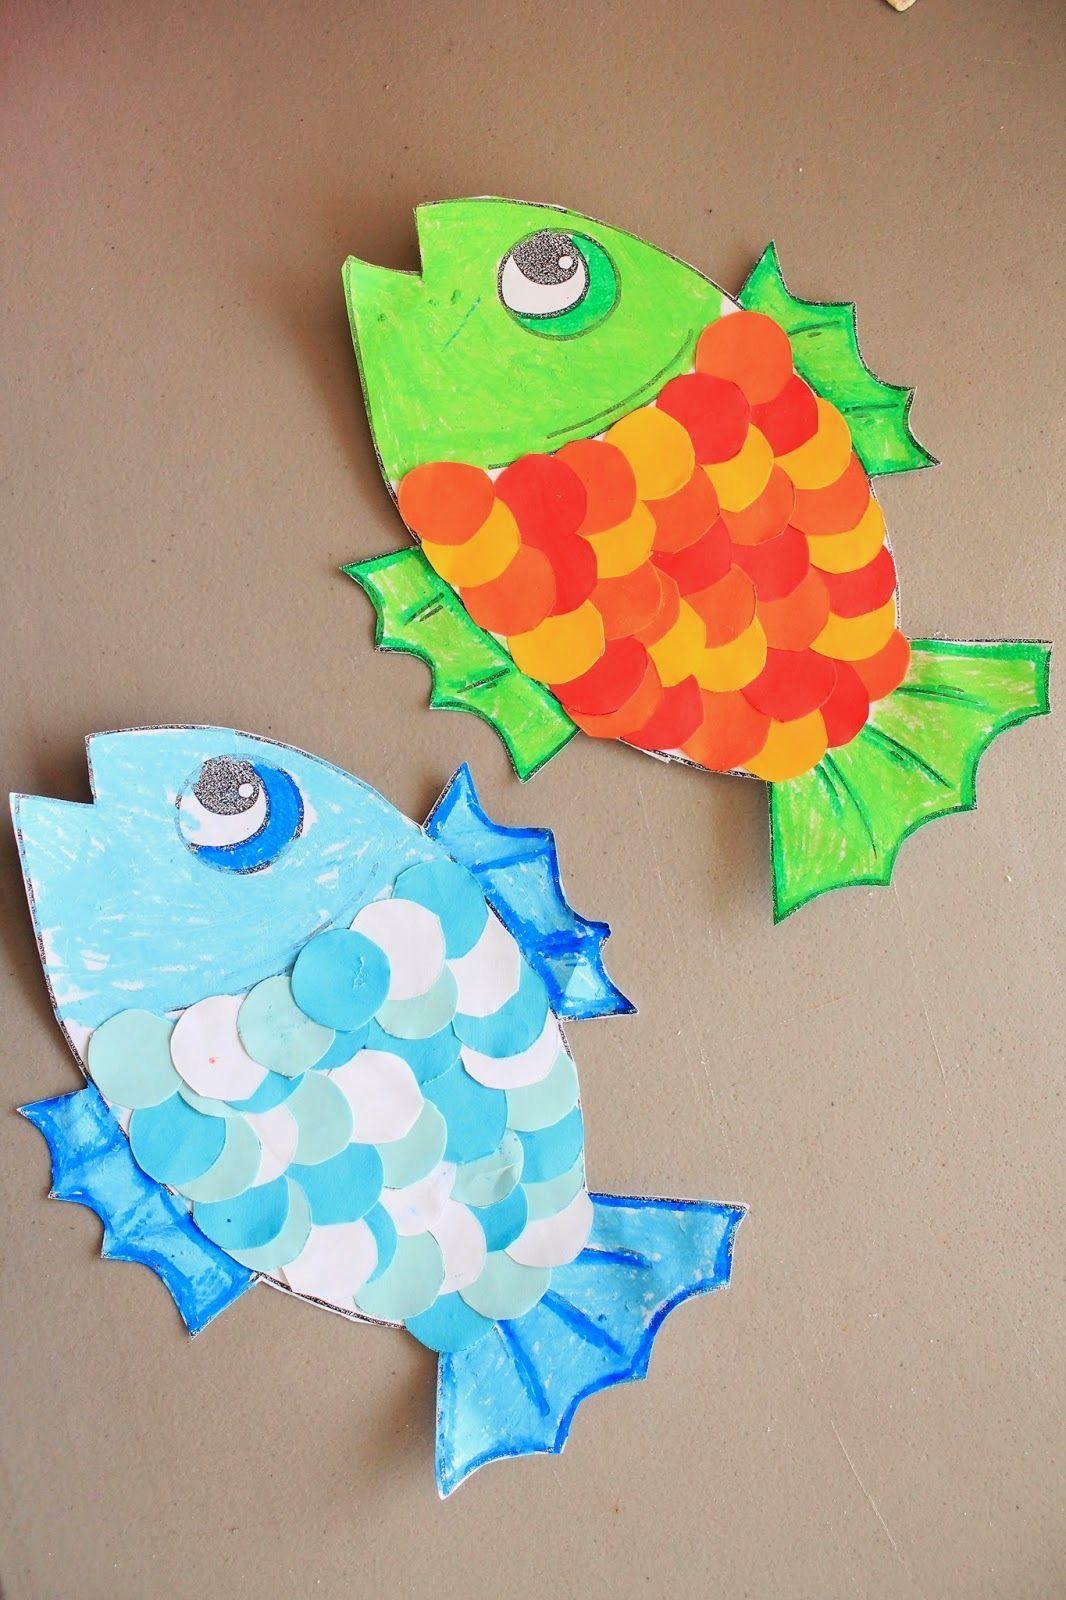 Pin by Vicki Evans on art Crafts for kids, Crafts, Art